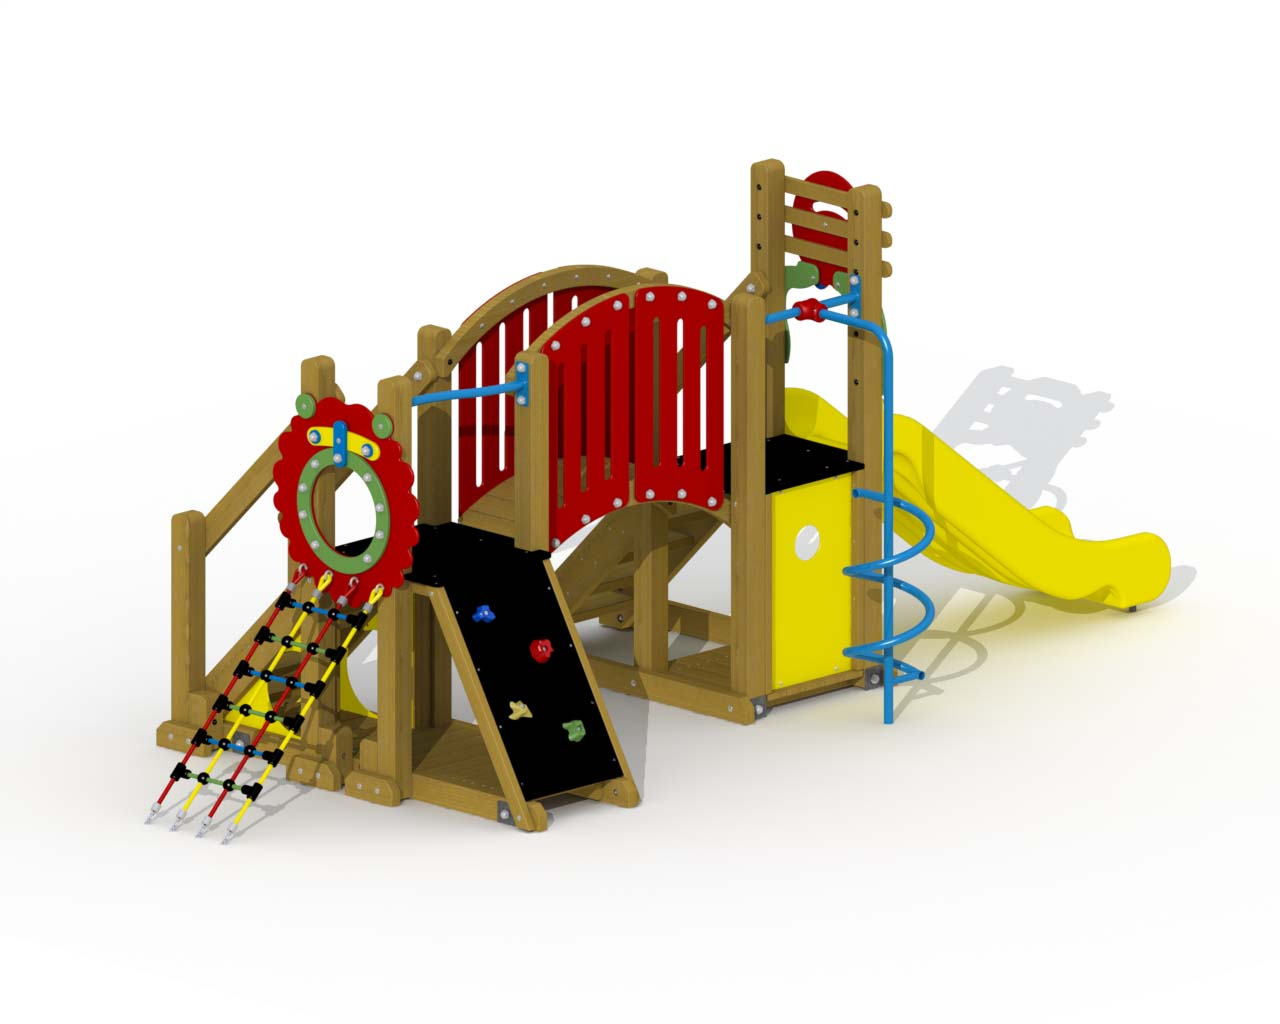 Mammoth (polymer Slide, Arched Bridge, Spiral Fireman's Pole)